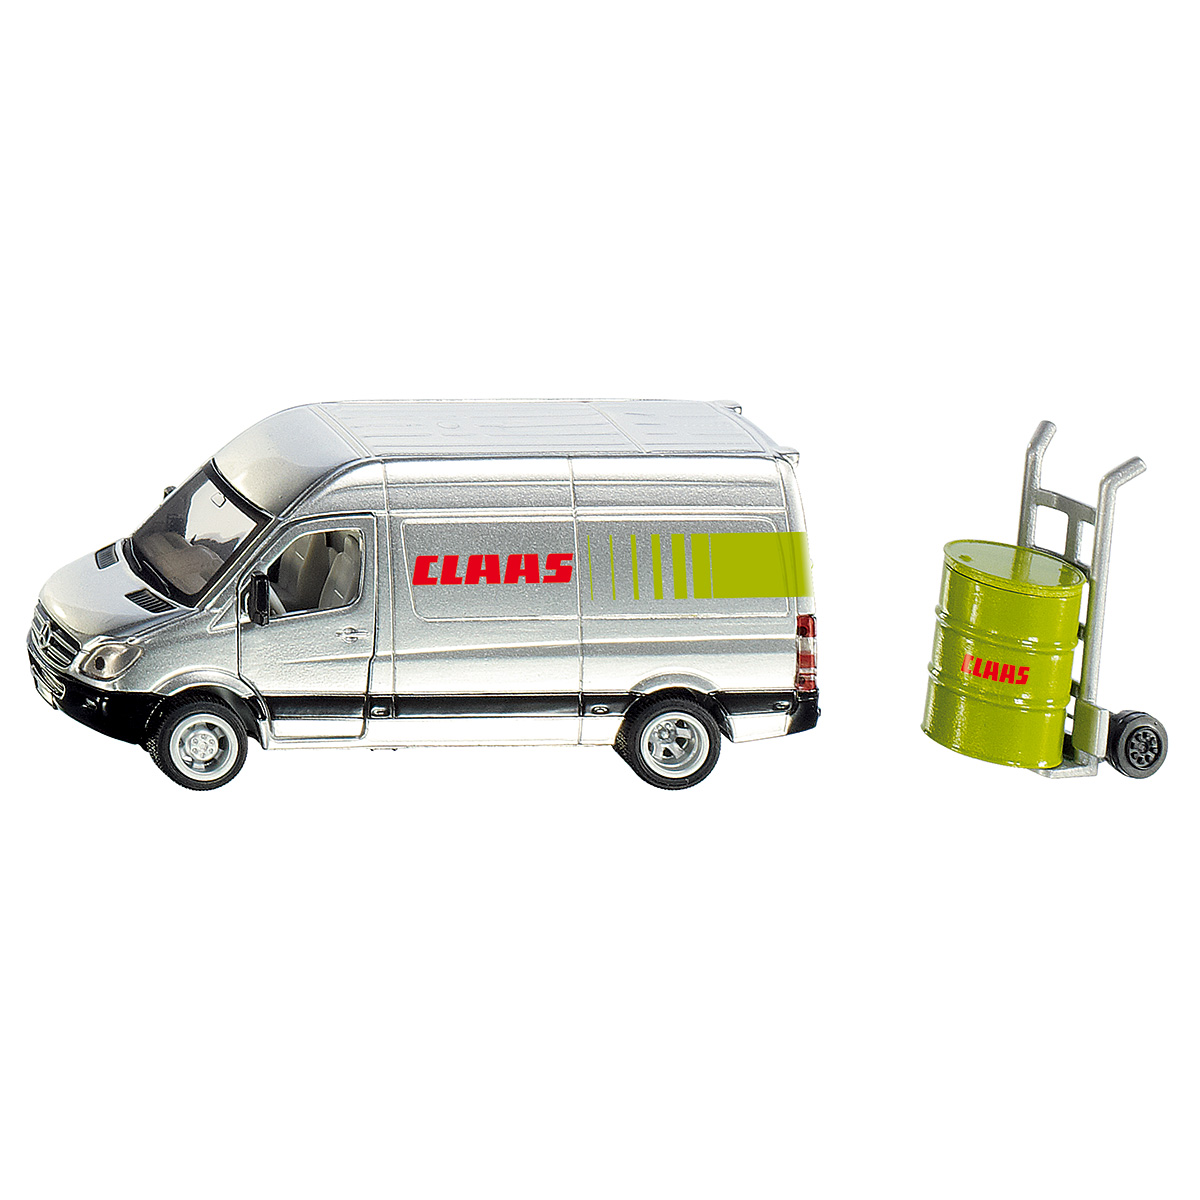 Claas サービスカー (ジク・SIKU)